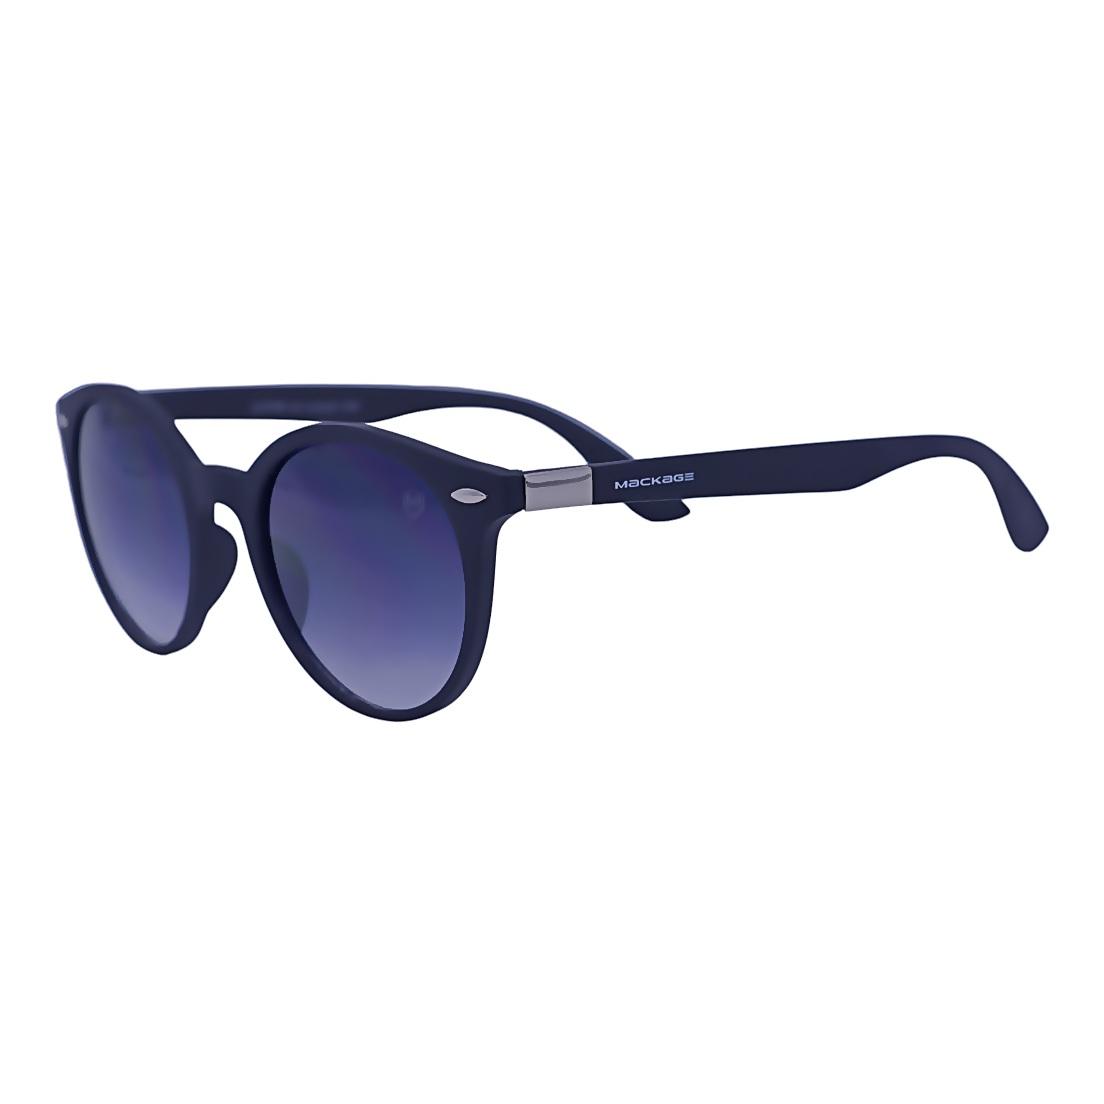 Óculos De Sol Mackage Unissex Acetato Wayfarer Redondo - Preto Fosco